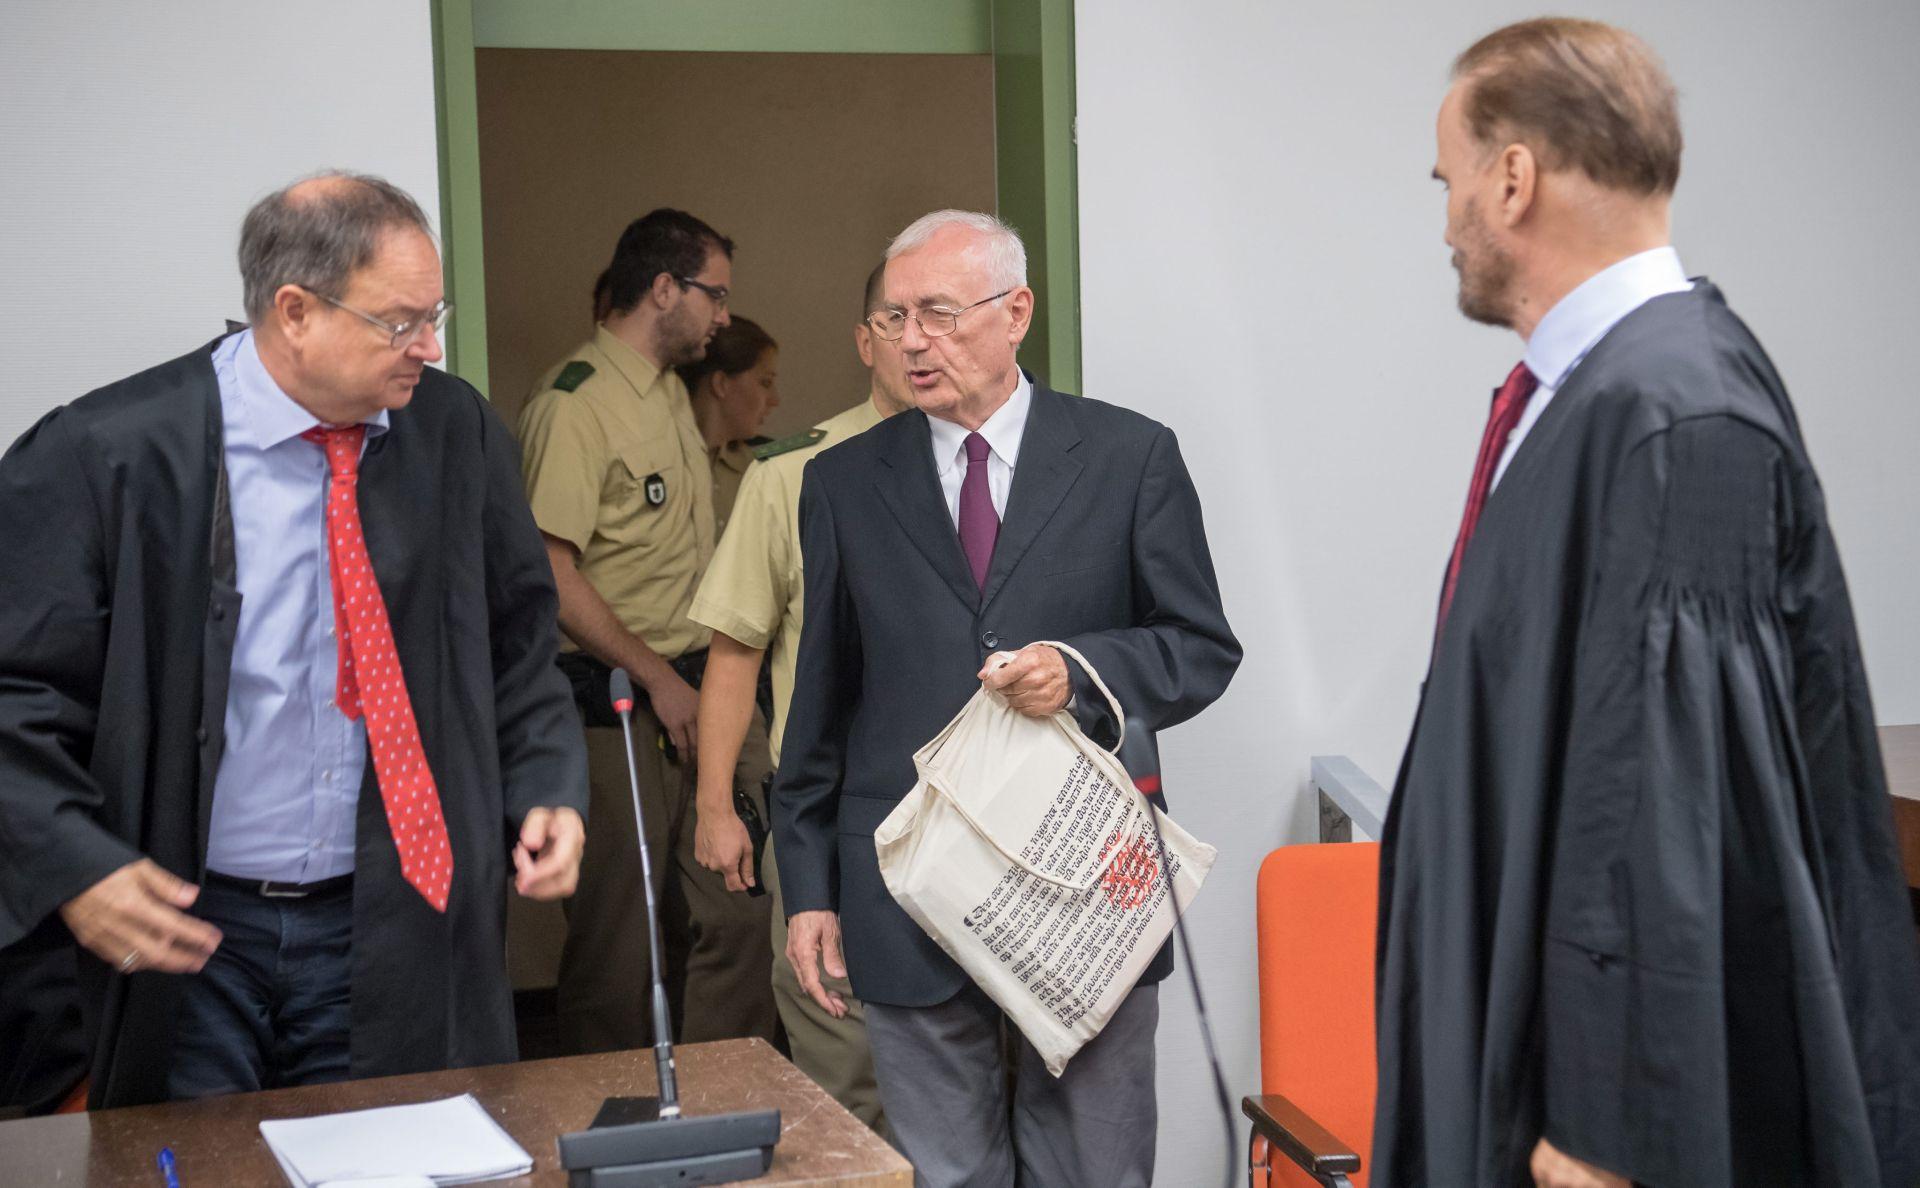 DOŽIVOTNA KAZNA: Perkovićevi odvjetnici službeno najavili žalbu na presudu